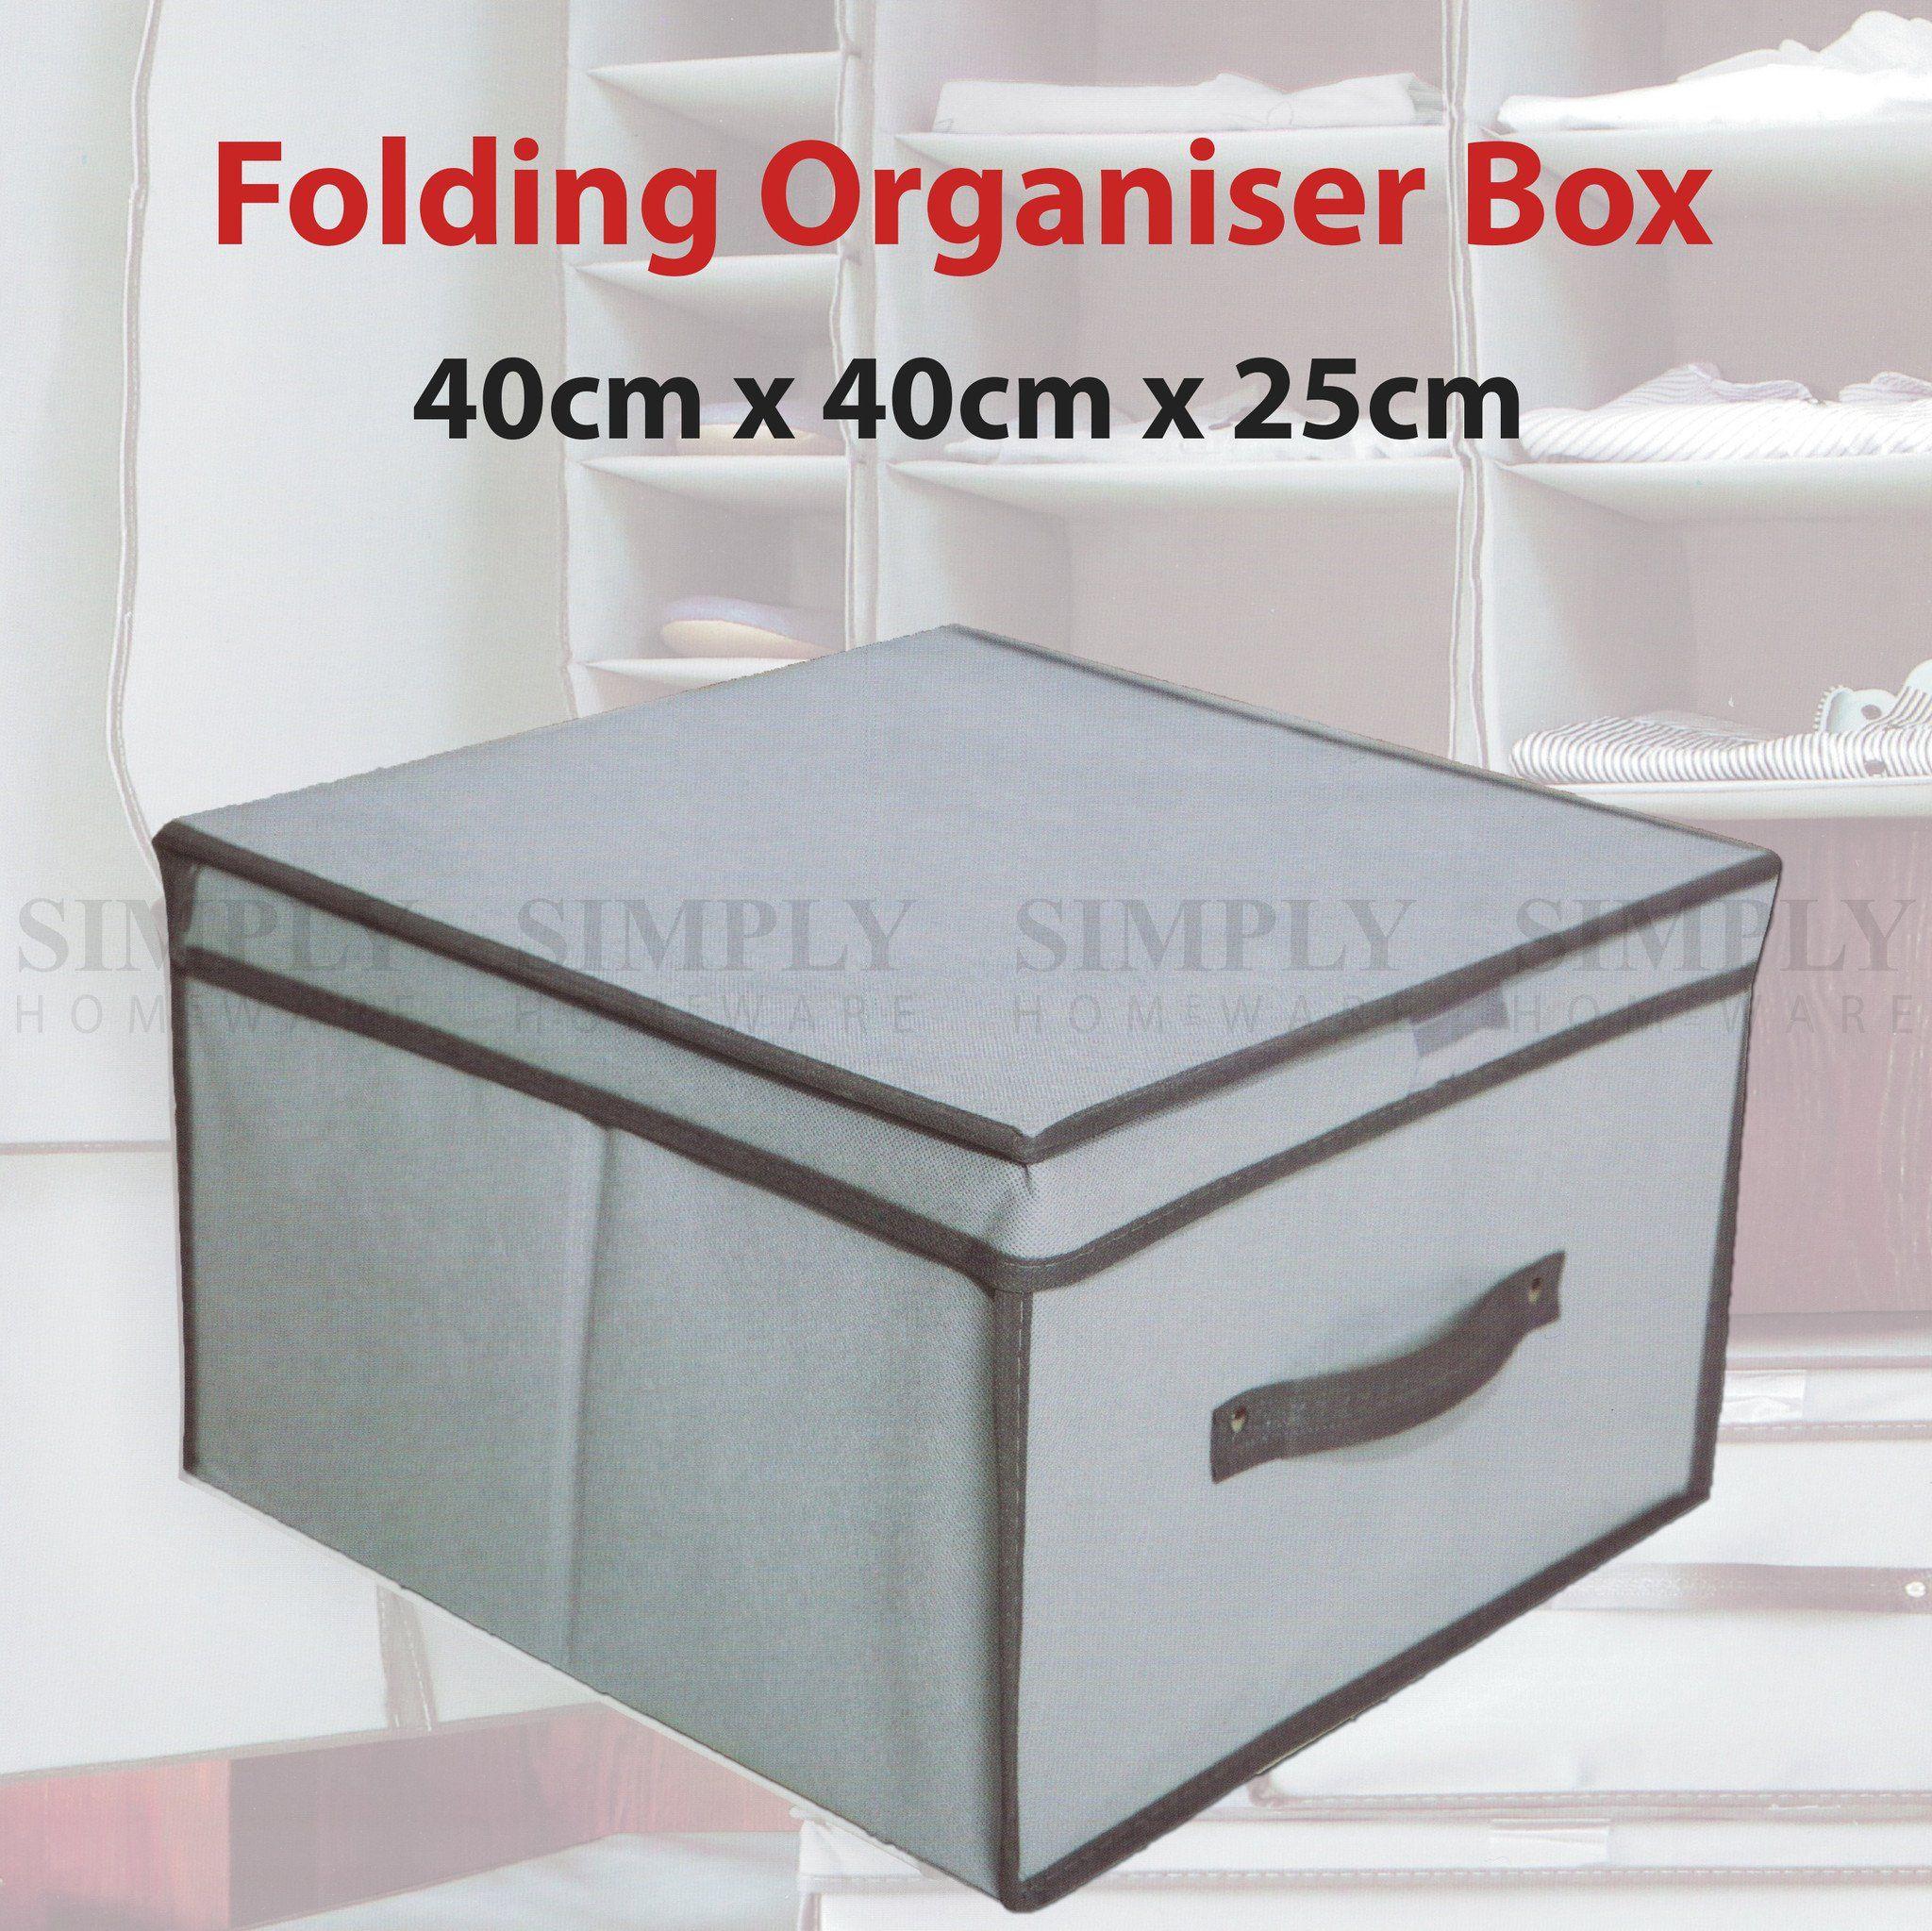 Folding Storage Box Basket Fabric Organiser Container Organizer Grey 40x40x25cm Organization Boxes Organize Fabric Storage Box